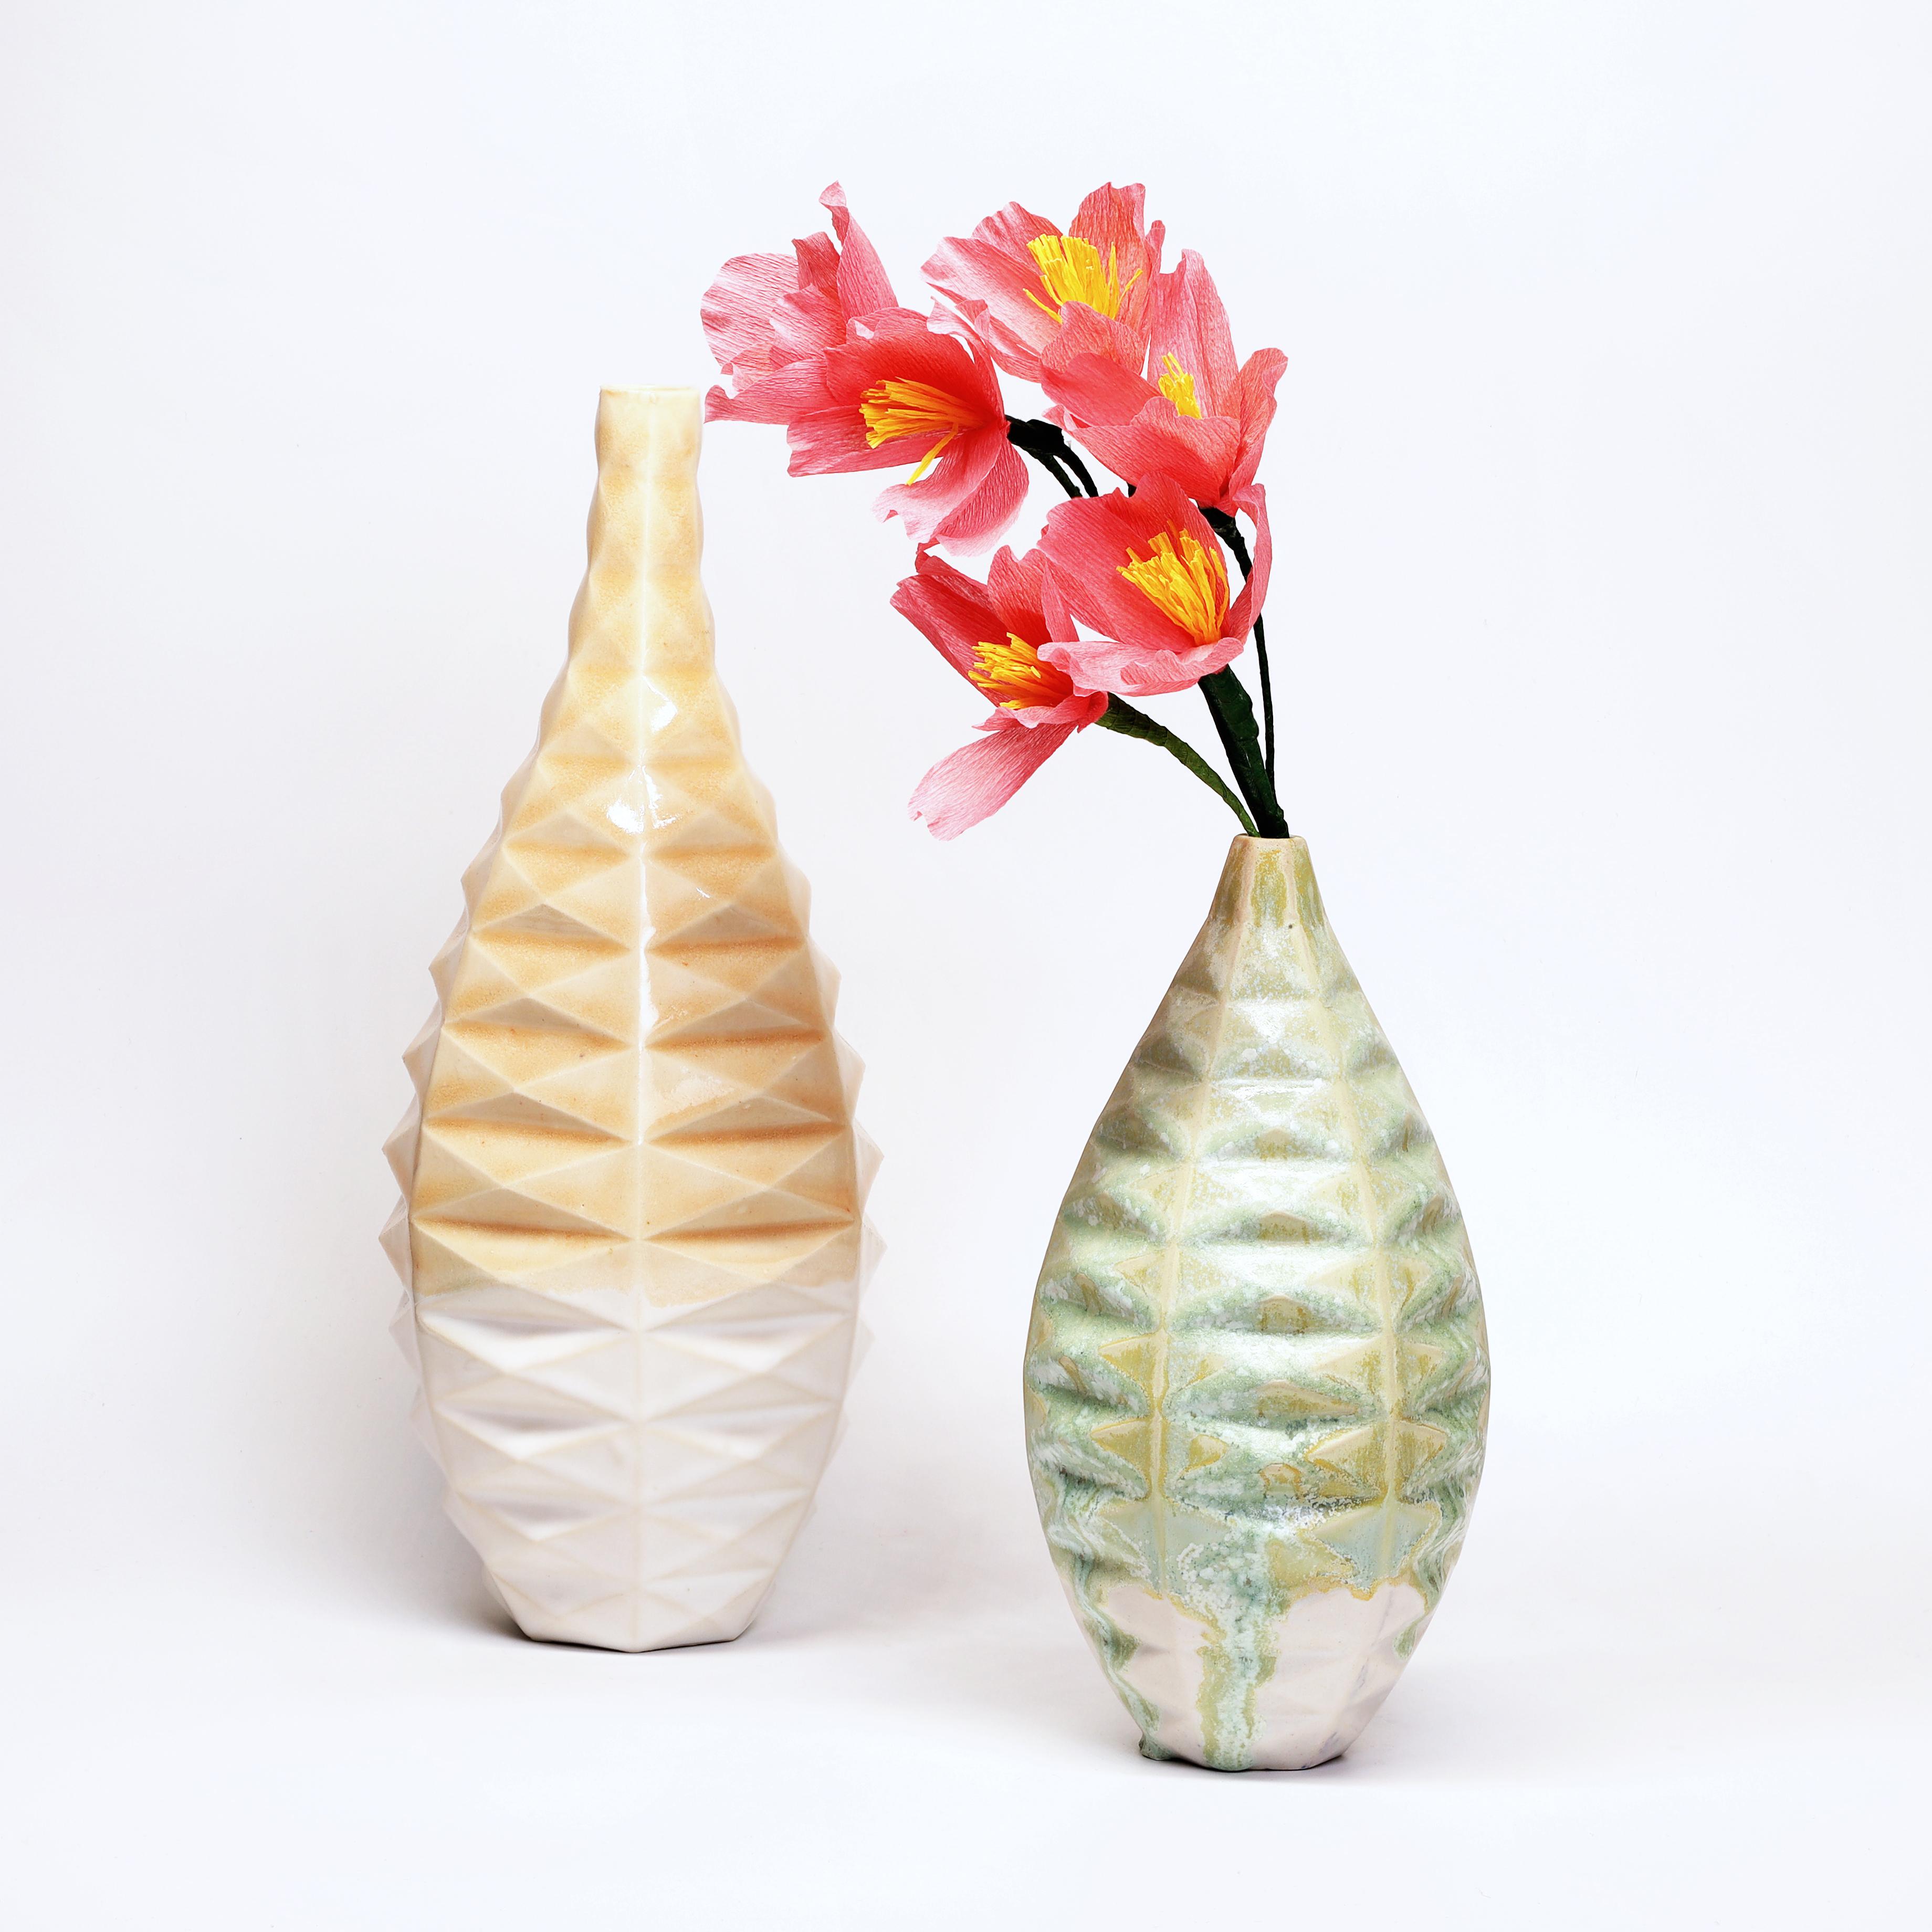 mediterranean-sea-bottle-flamingo-2s-ssflower